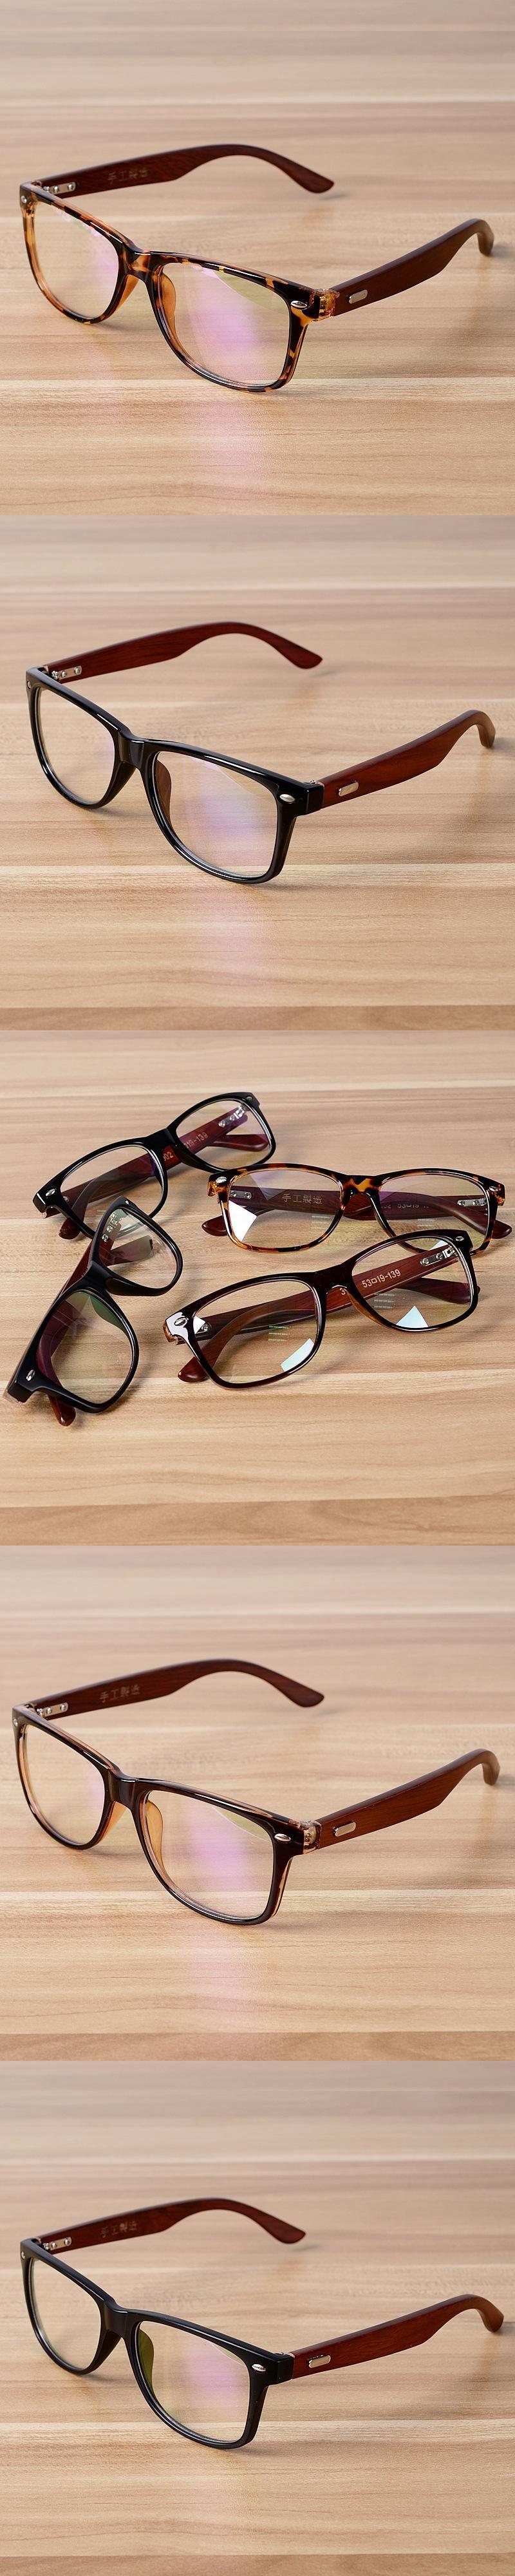 772657b15b Korean Glasses Frame Clear Lens Optical Frames Vintage Eyeglasses Wooden  Bamboo Brown Leopard Eyewear Frames Spectacle